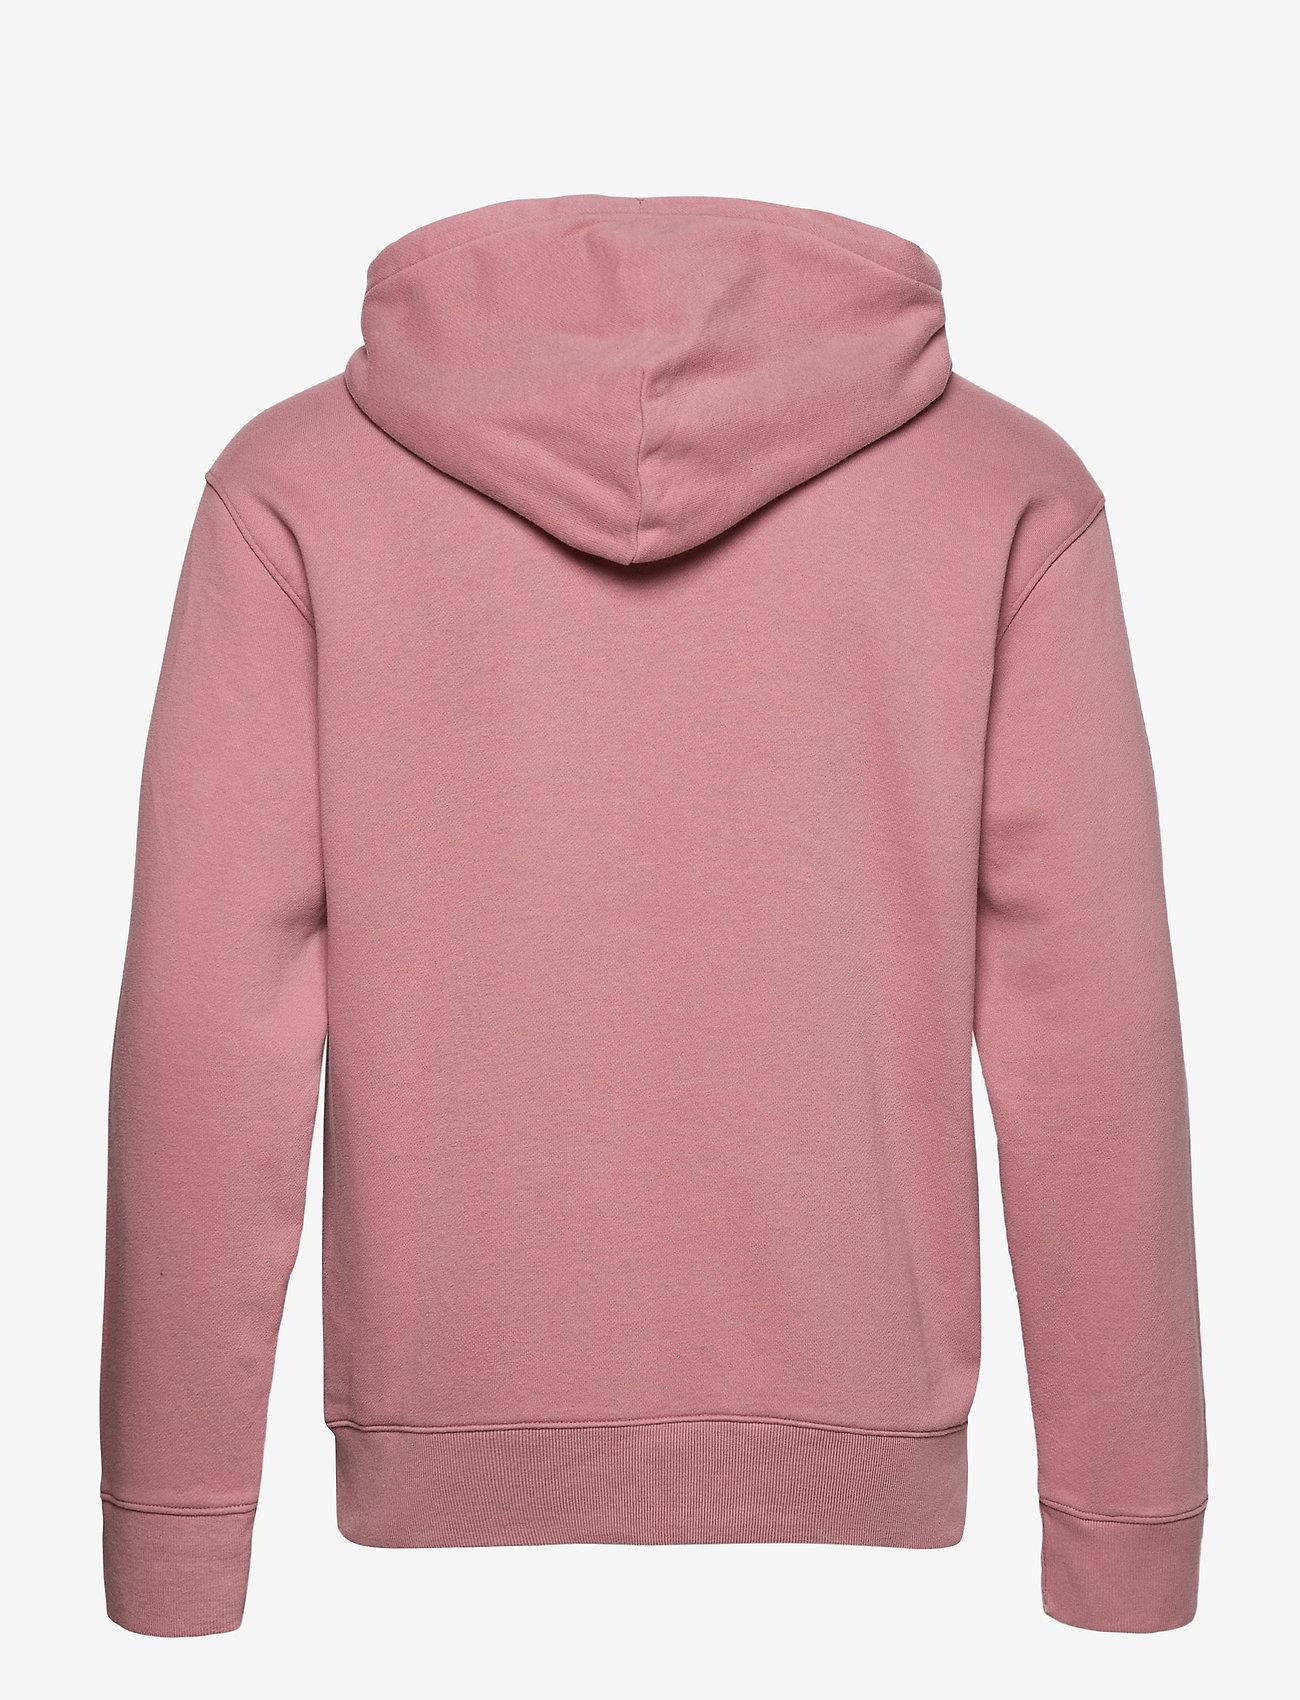 Hollister HCo. GUYS SWEATSHIRTS - Sweatshirts LIGHT PINK DD - Menn Klær